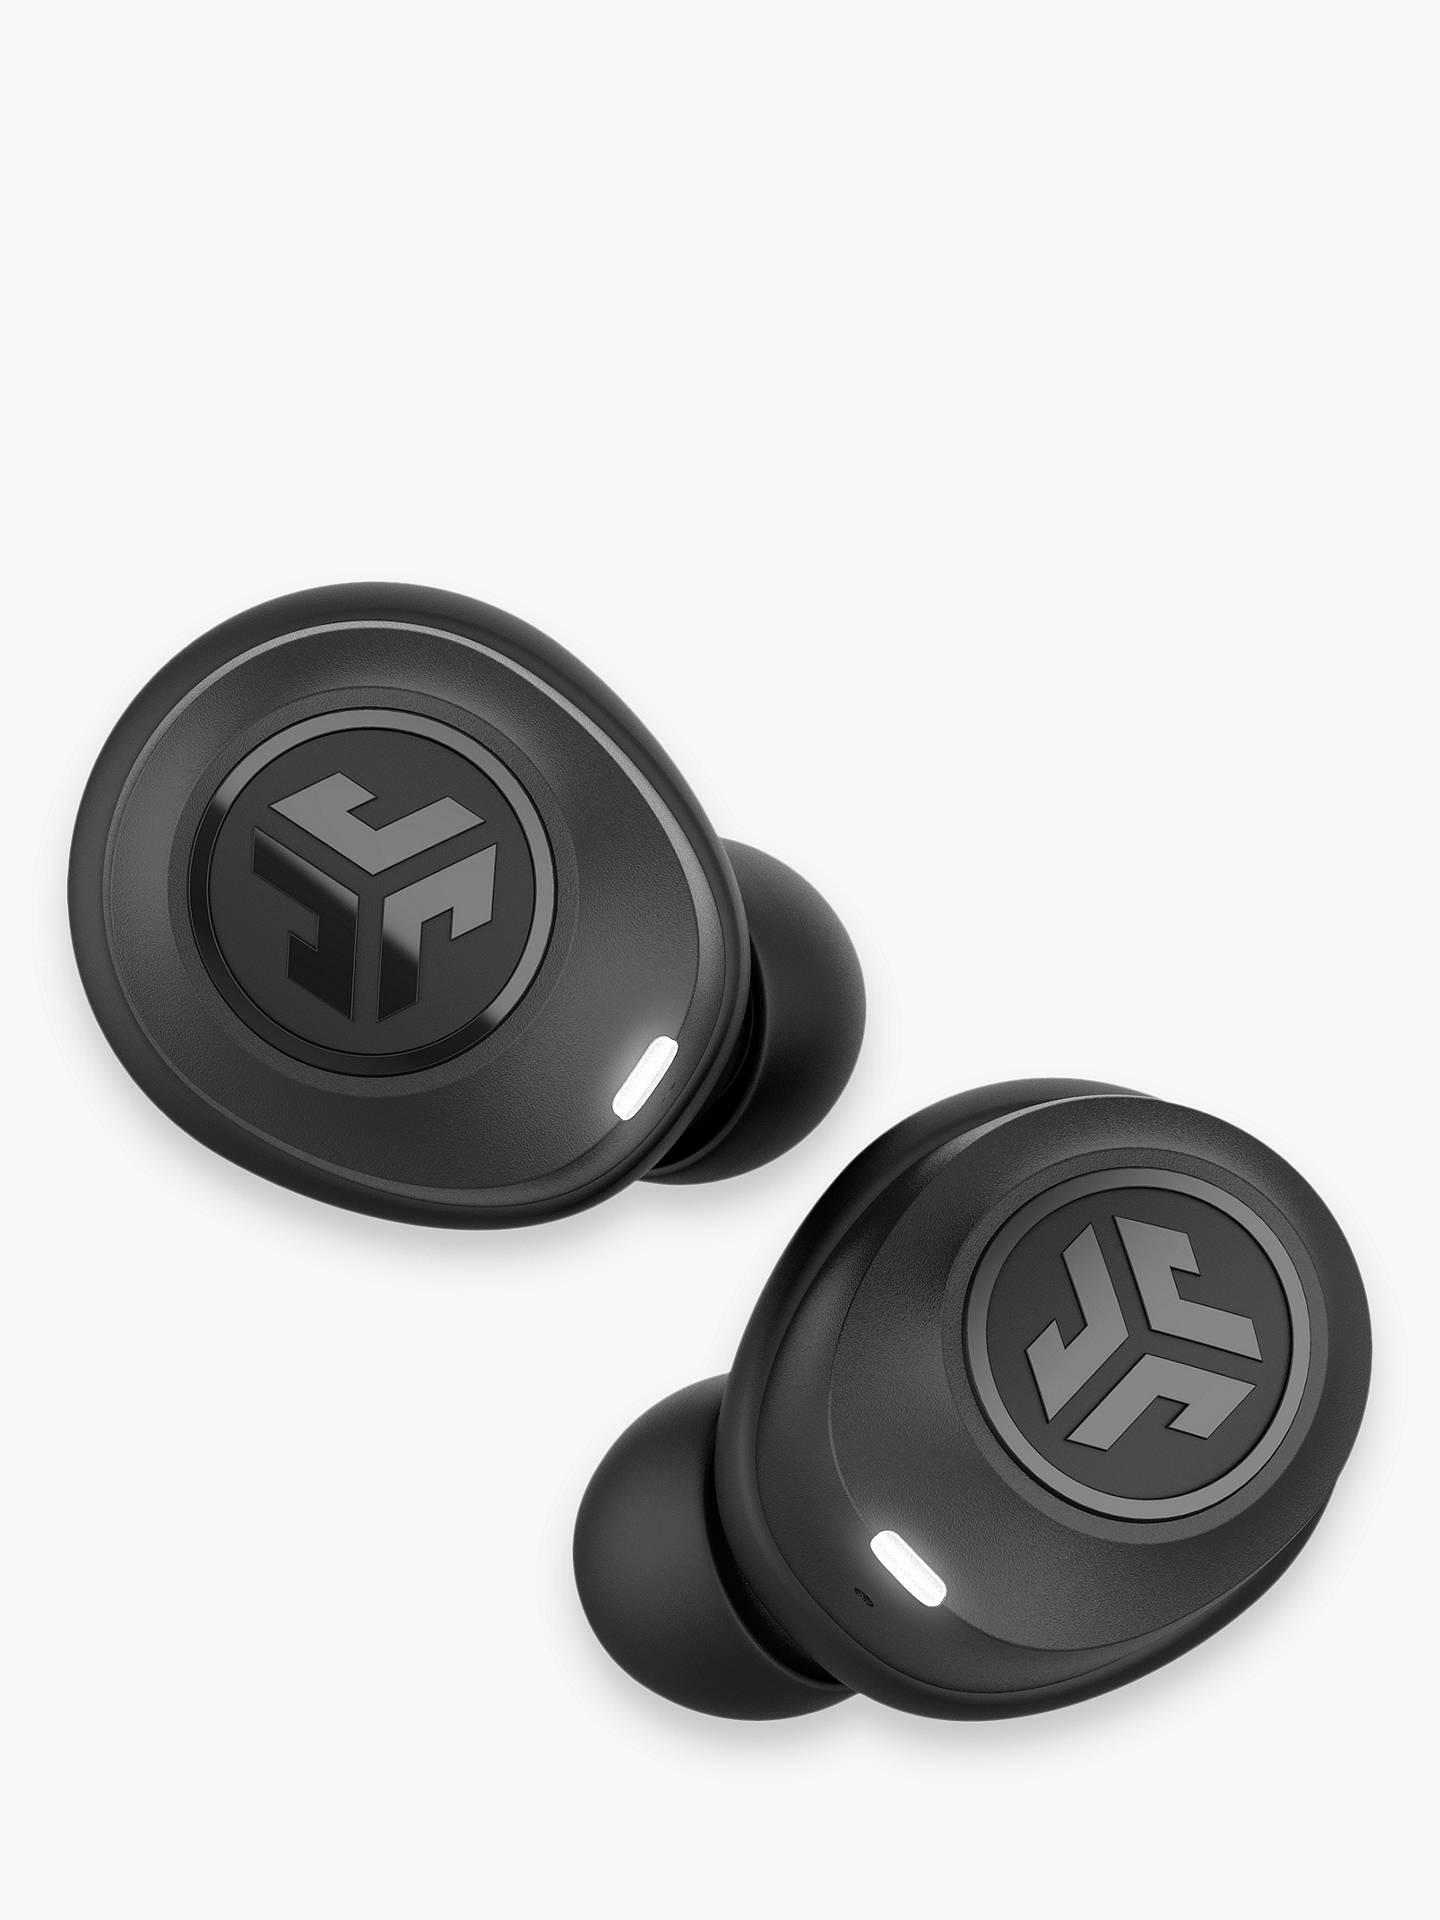 JLab Audio JBuds Air True Wireless Bluetooth In-Ear Headphones with  Mic/Remote, Black